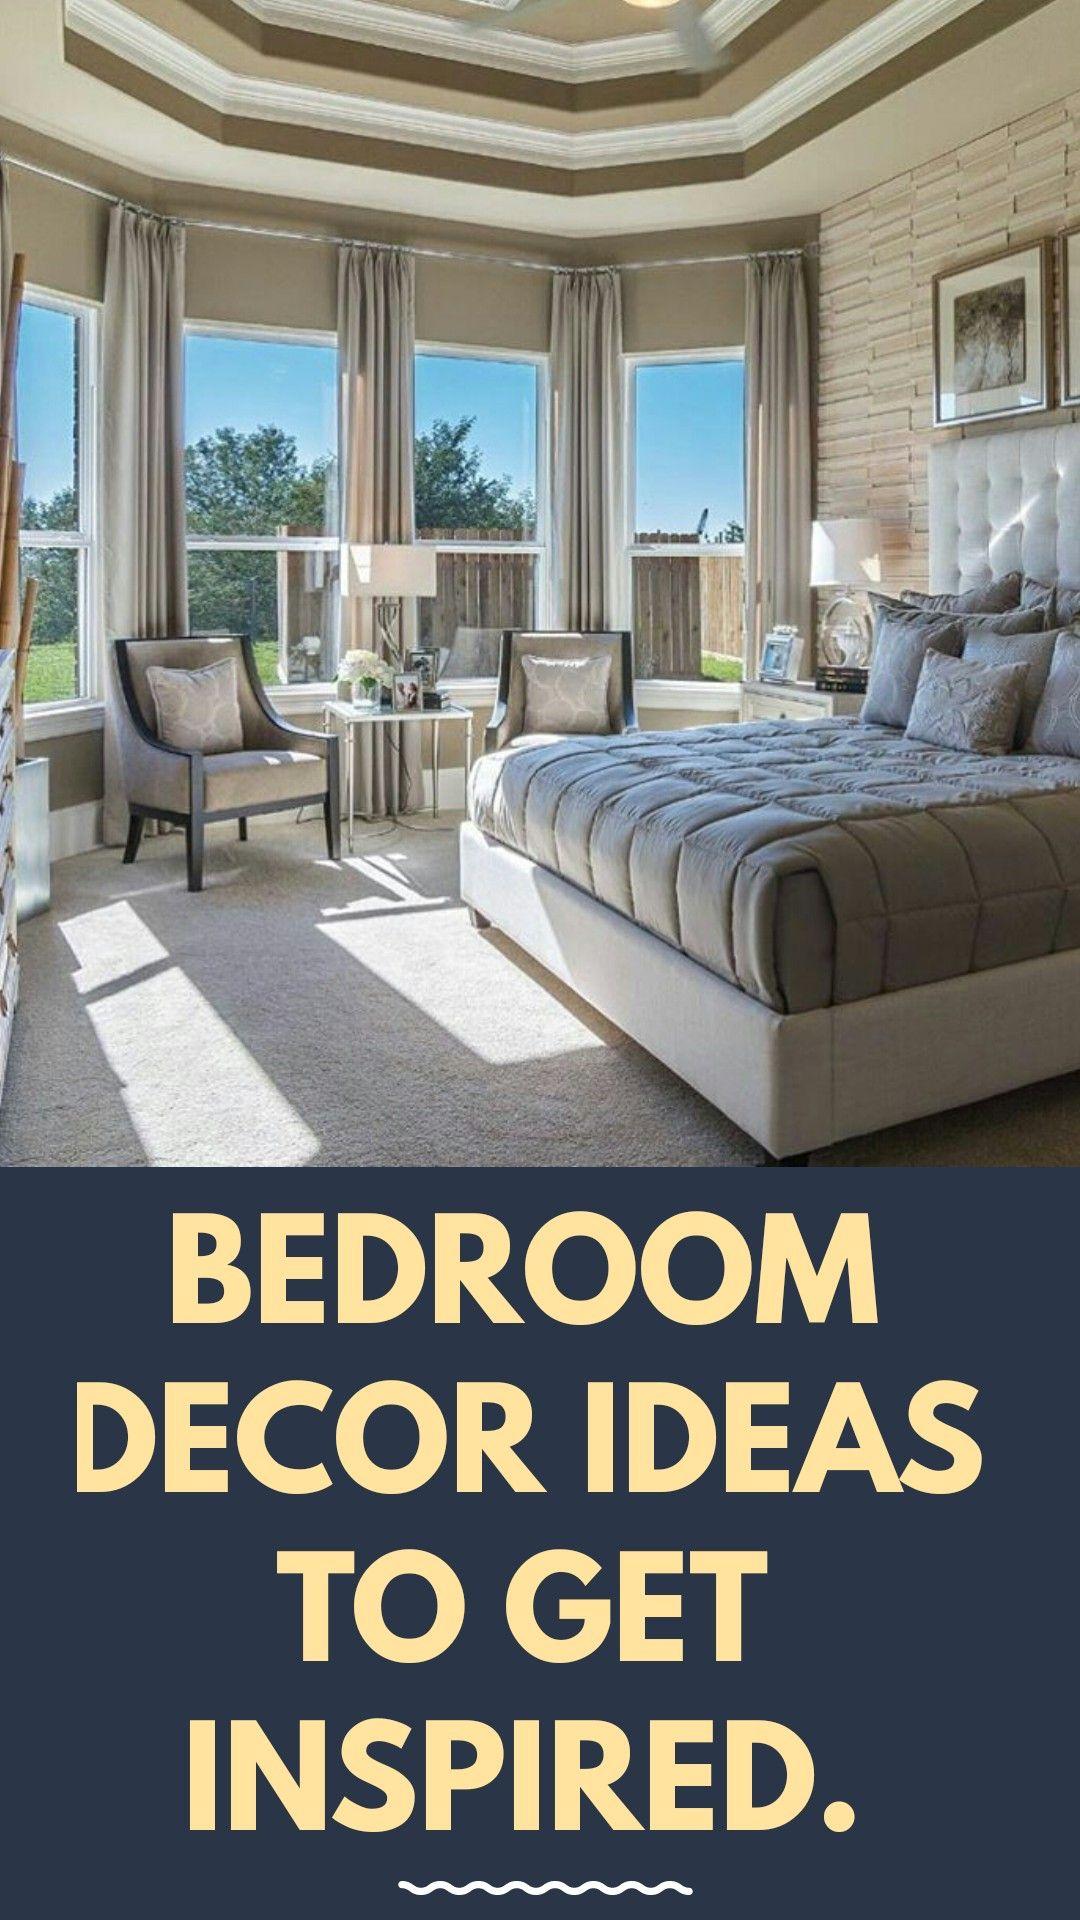 bedroom decor ideas to get inspired bedrooms modern interiors